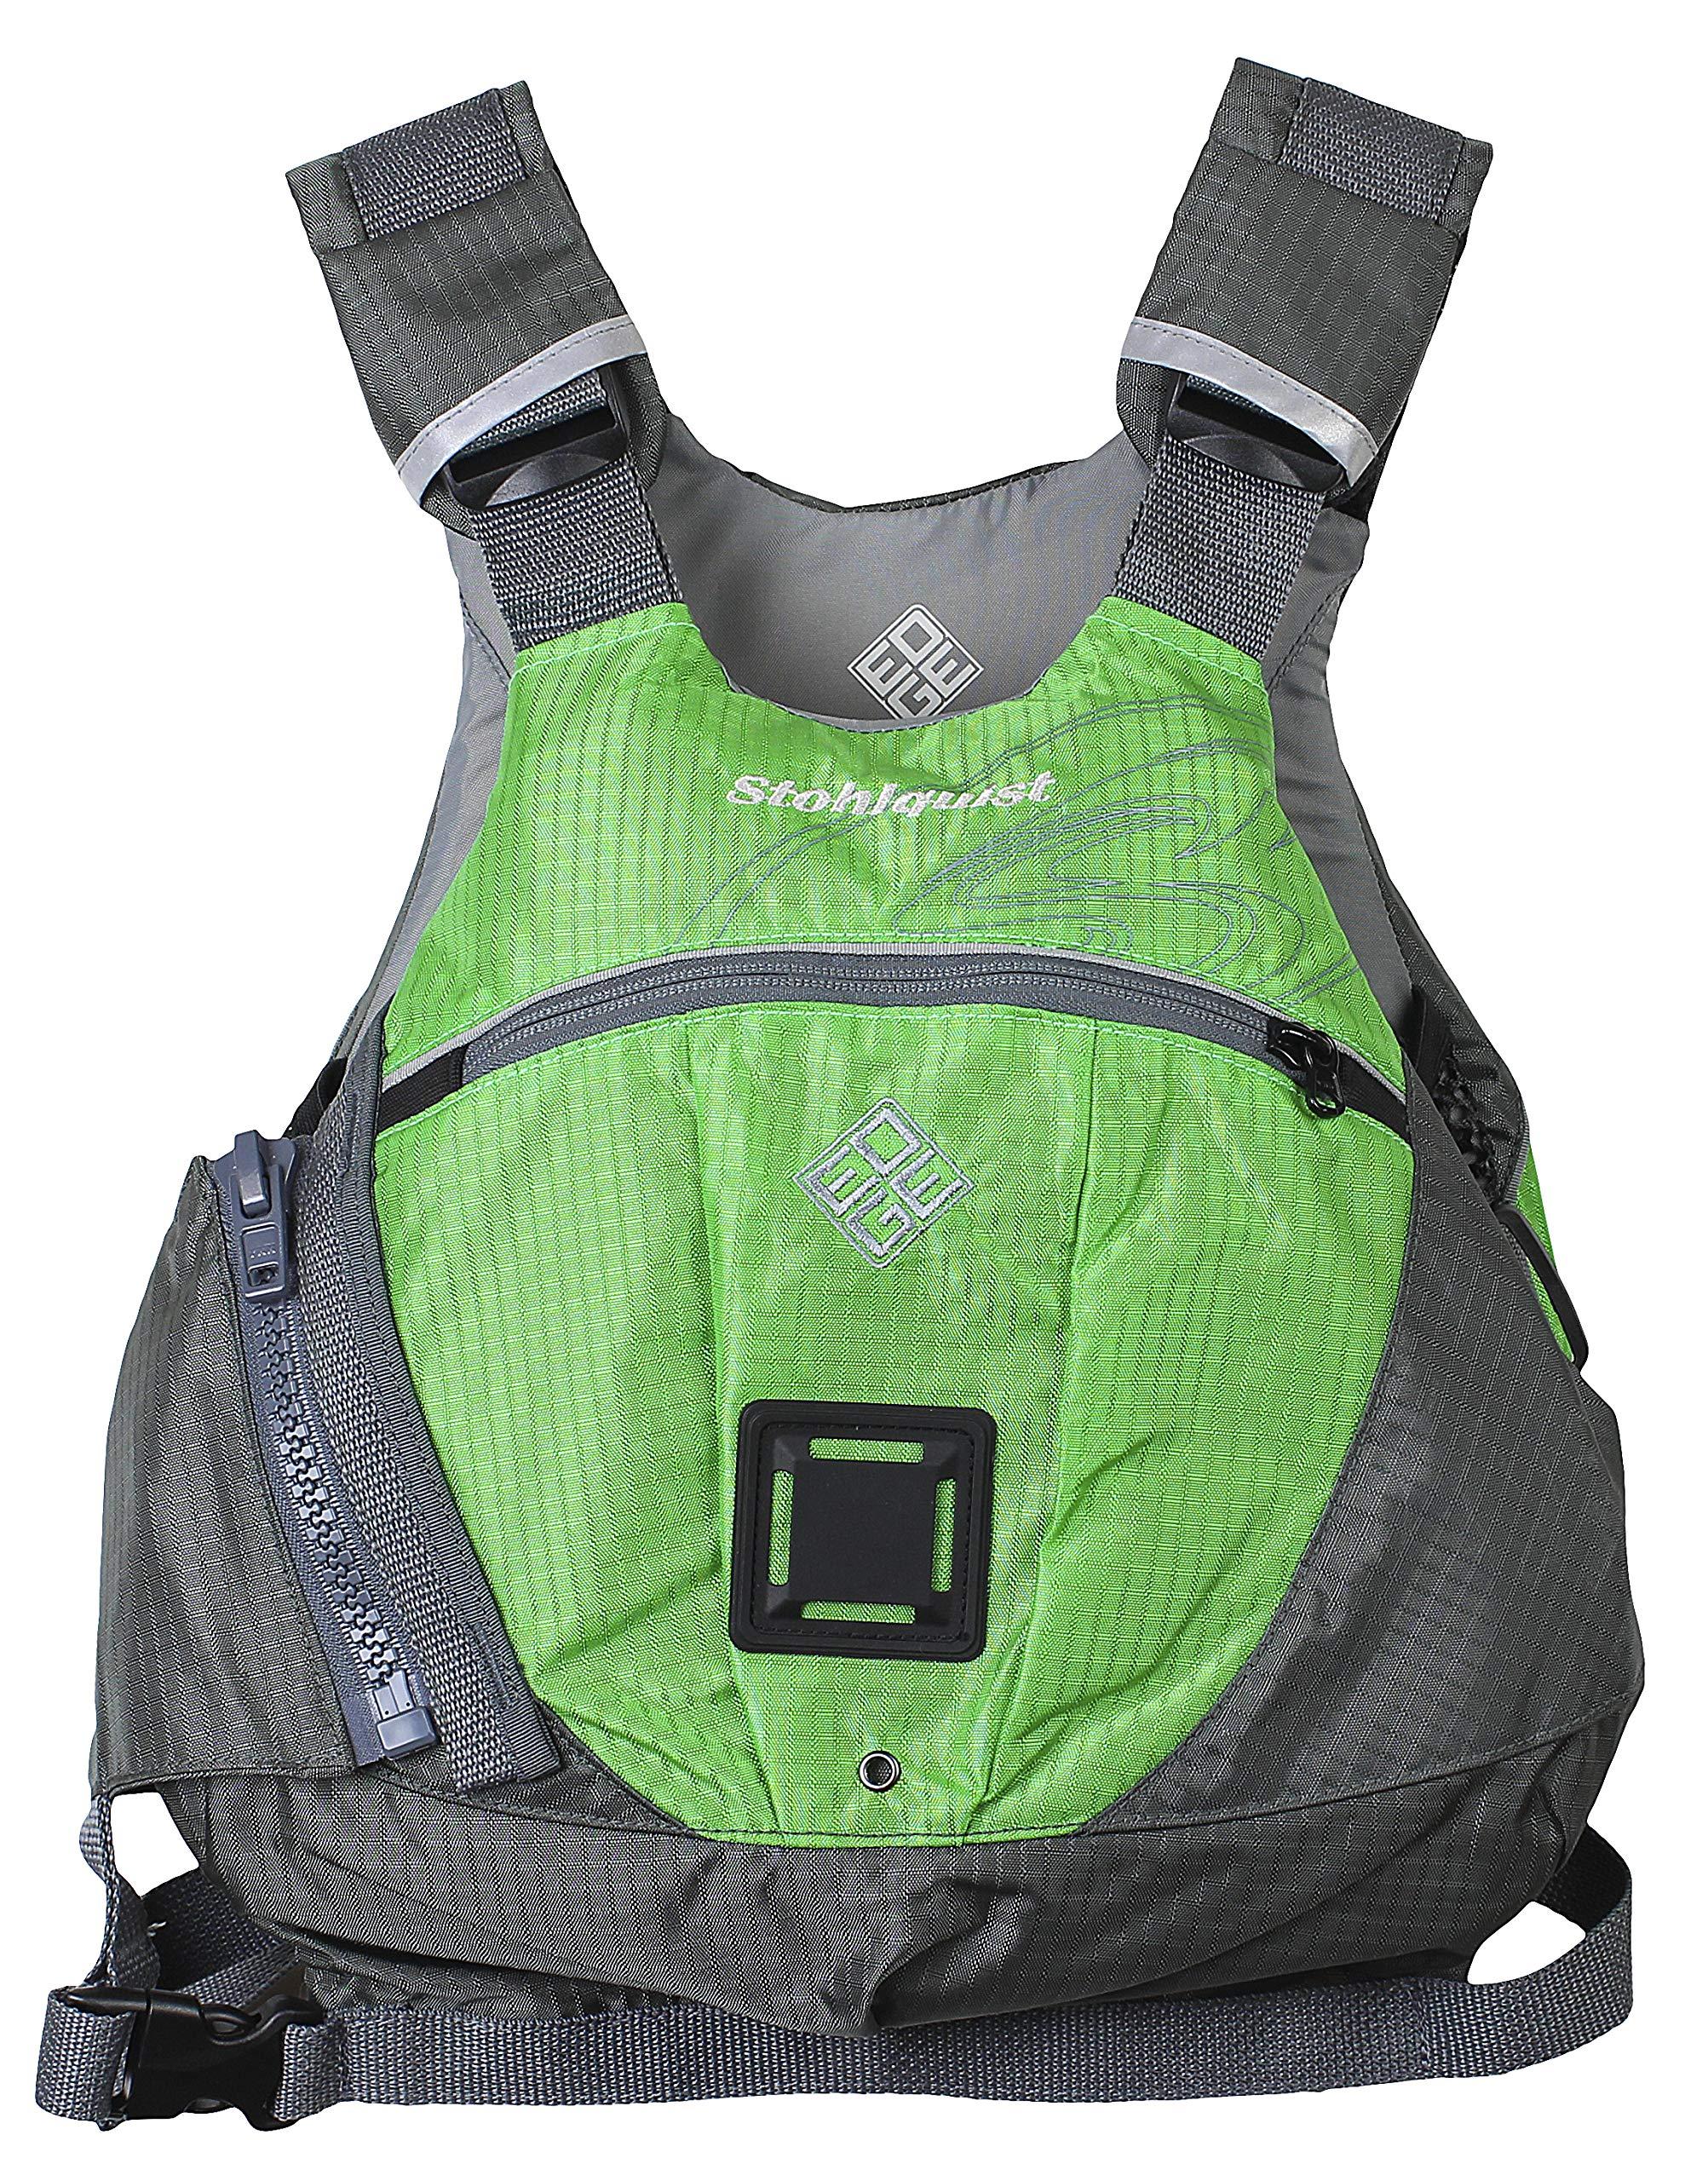 Stohlquist Edge Life Jacket, Lime Green/Gray, Small/Medium